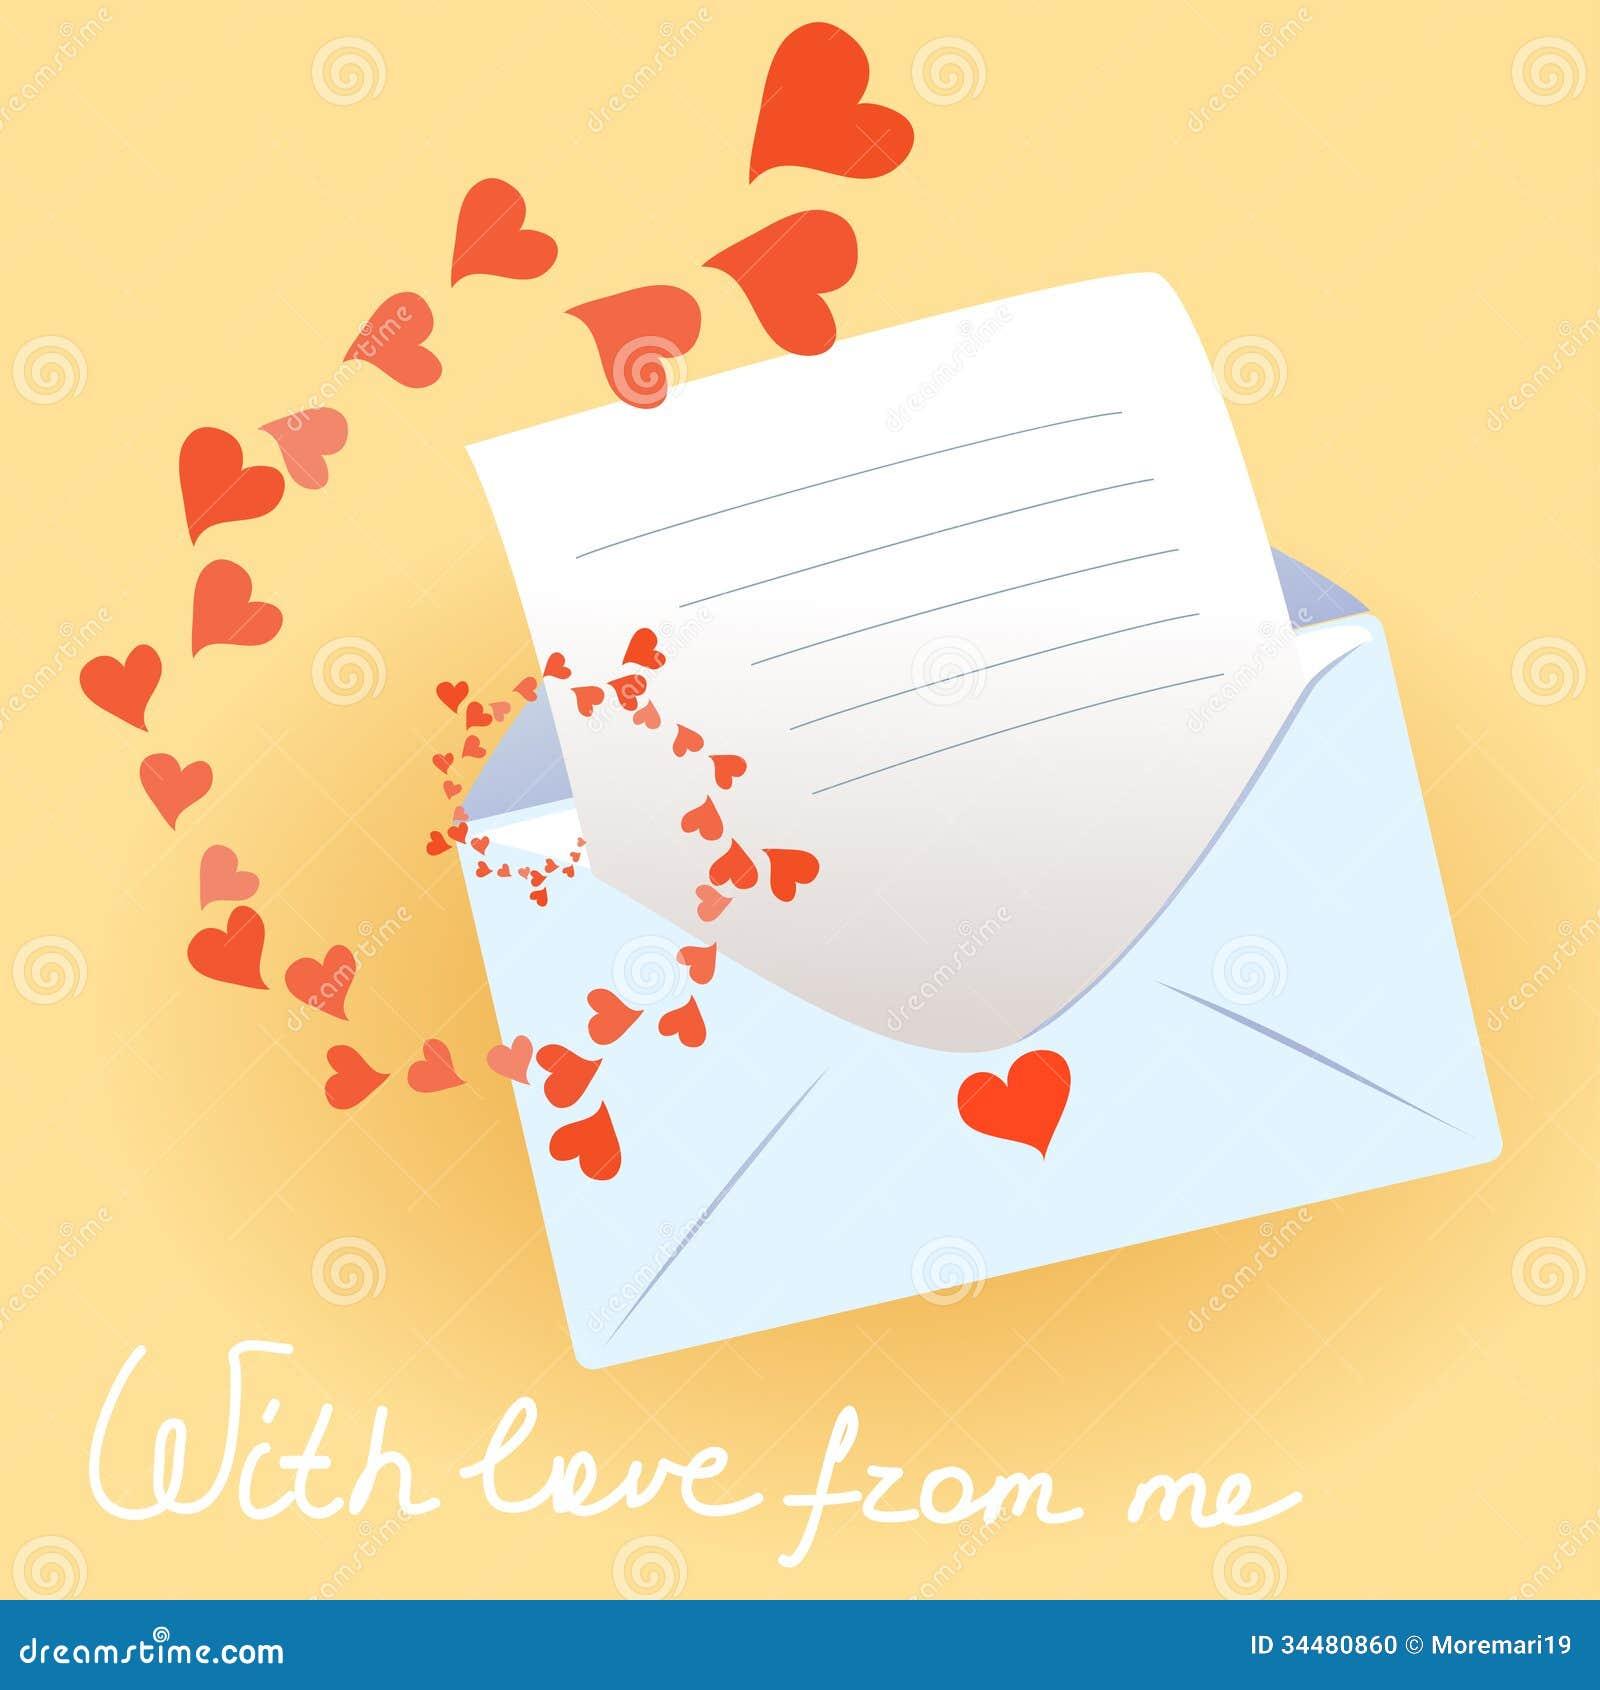 Love Letter Message Photo Frame